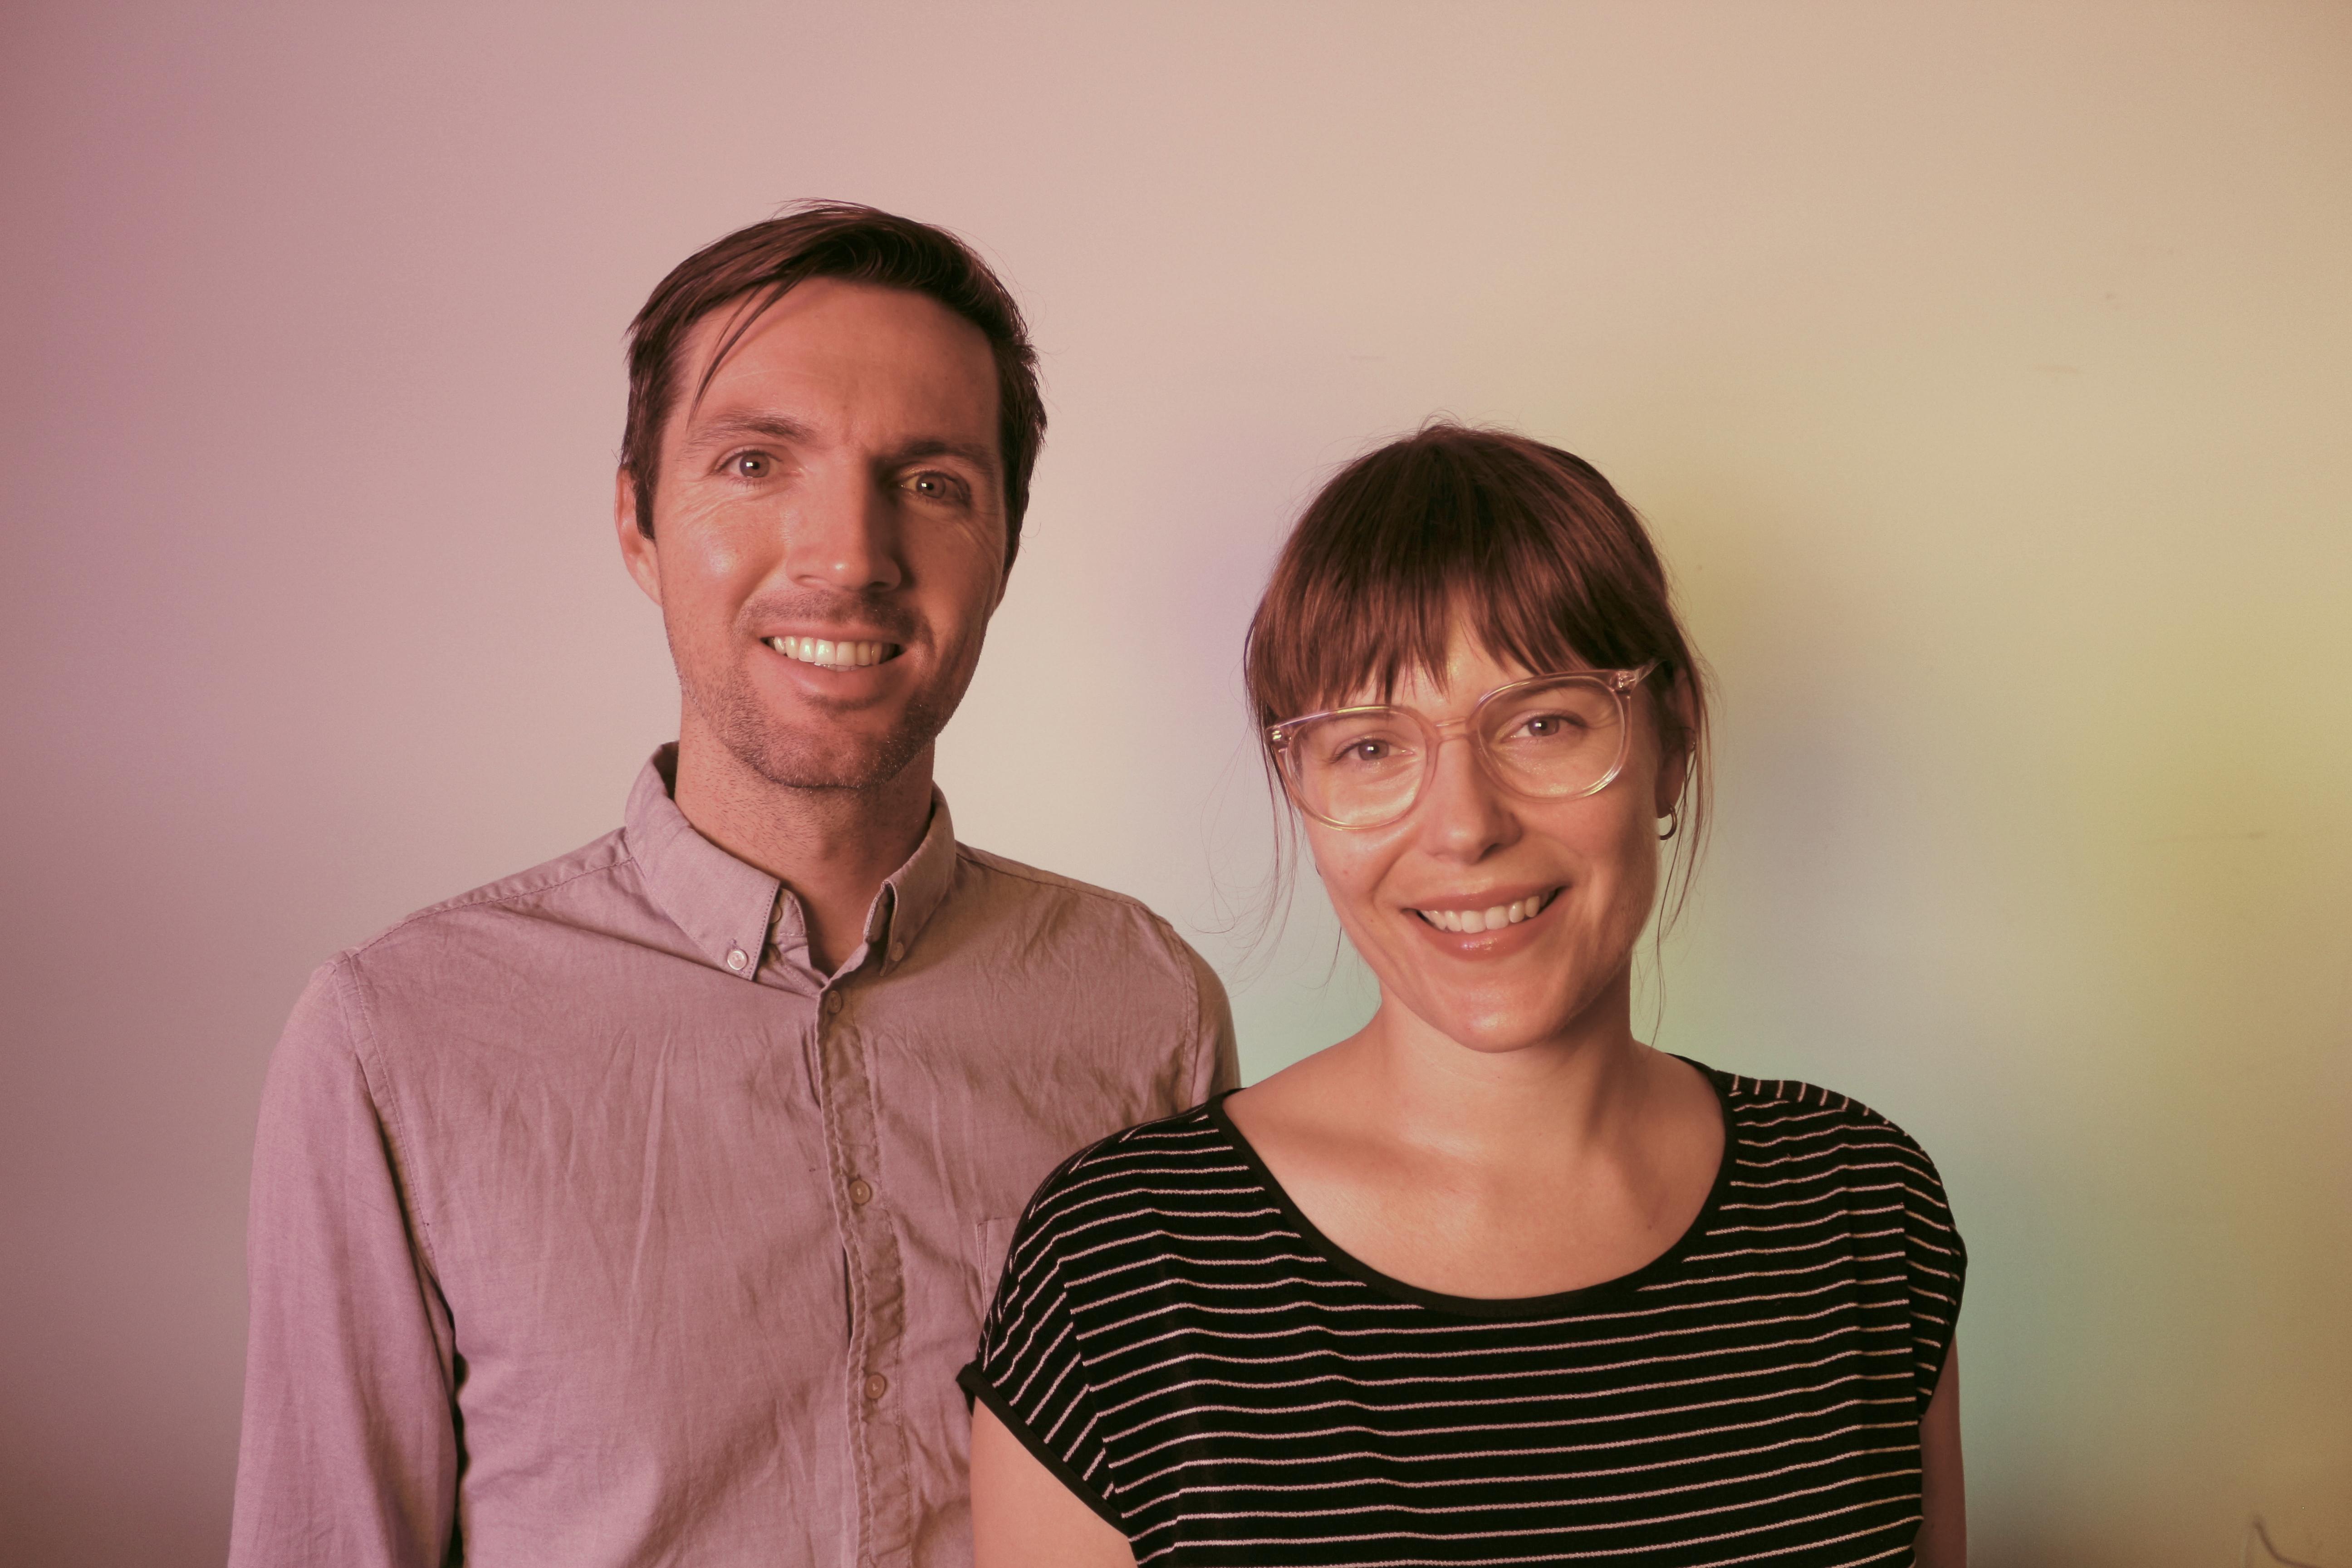 Erin Anderson and Danny Bracken